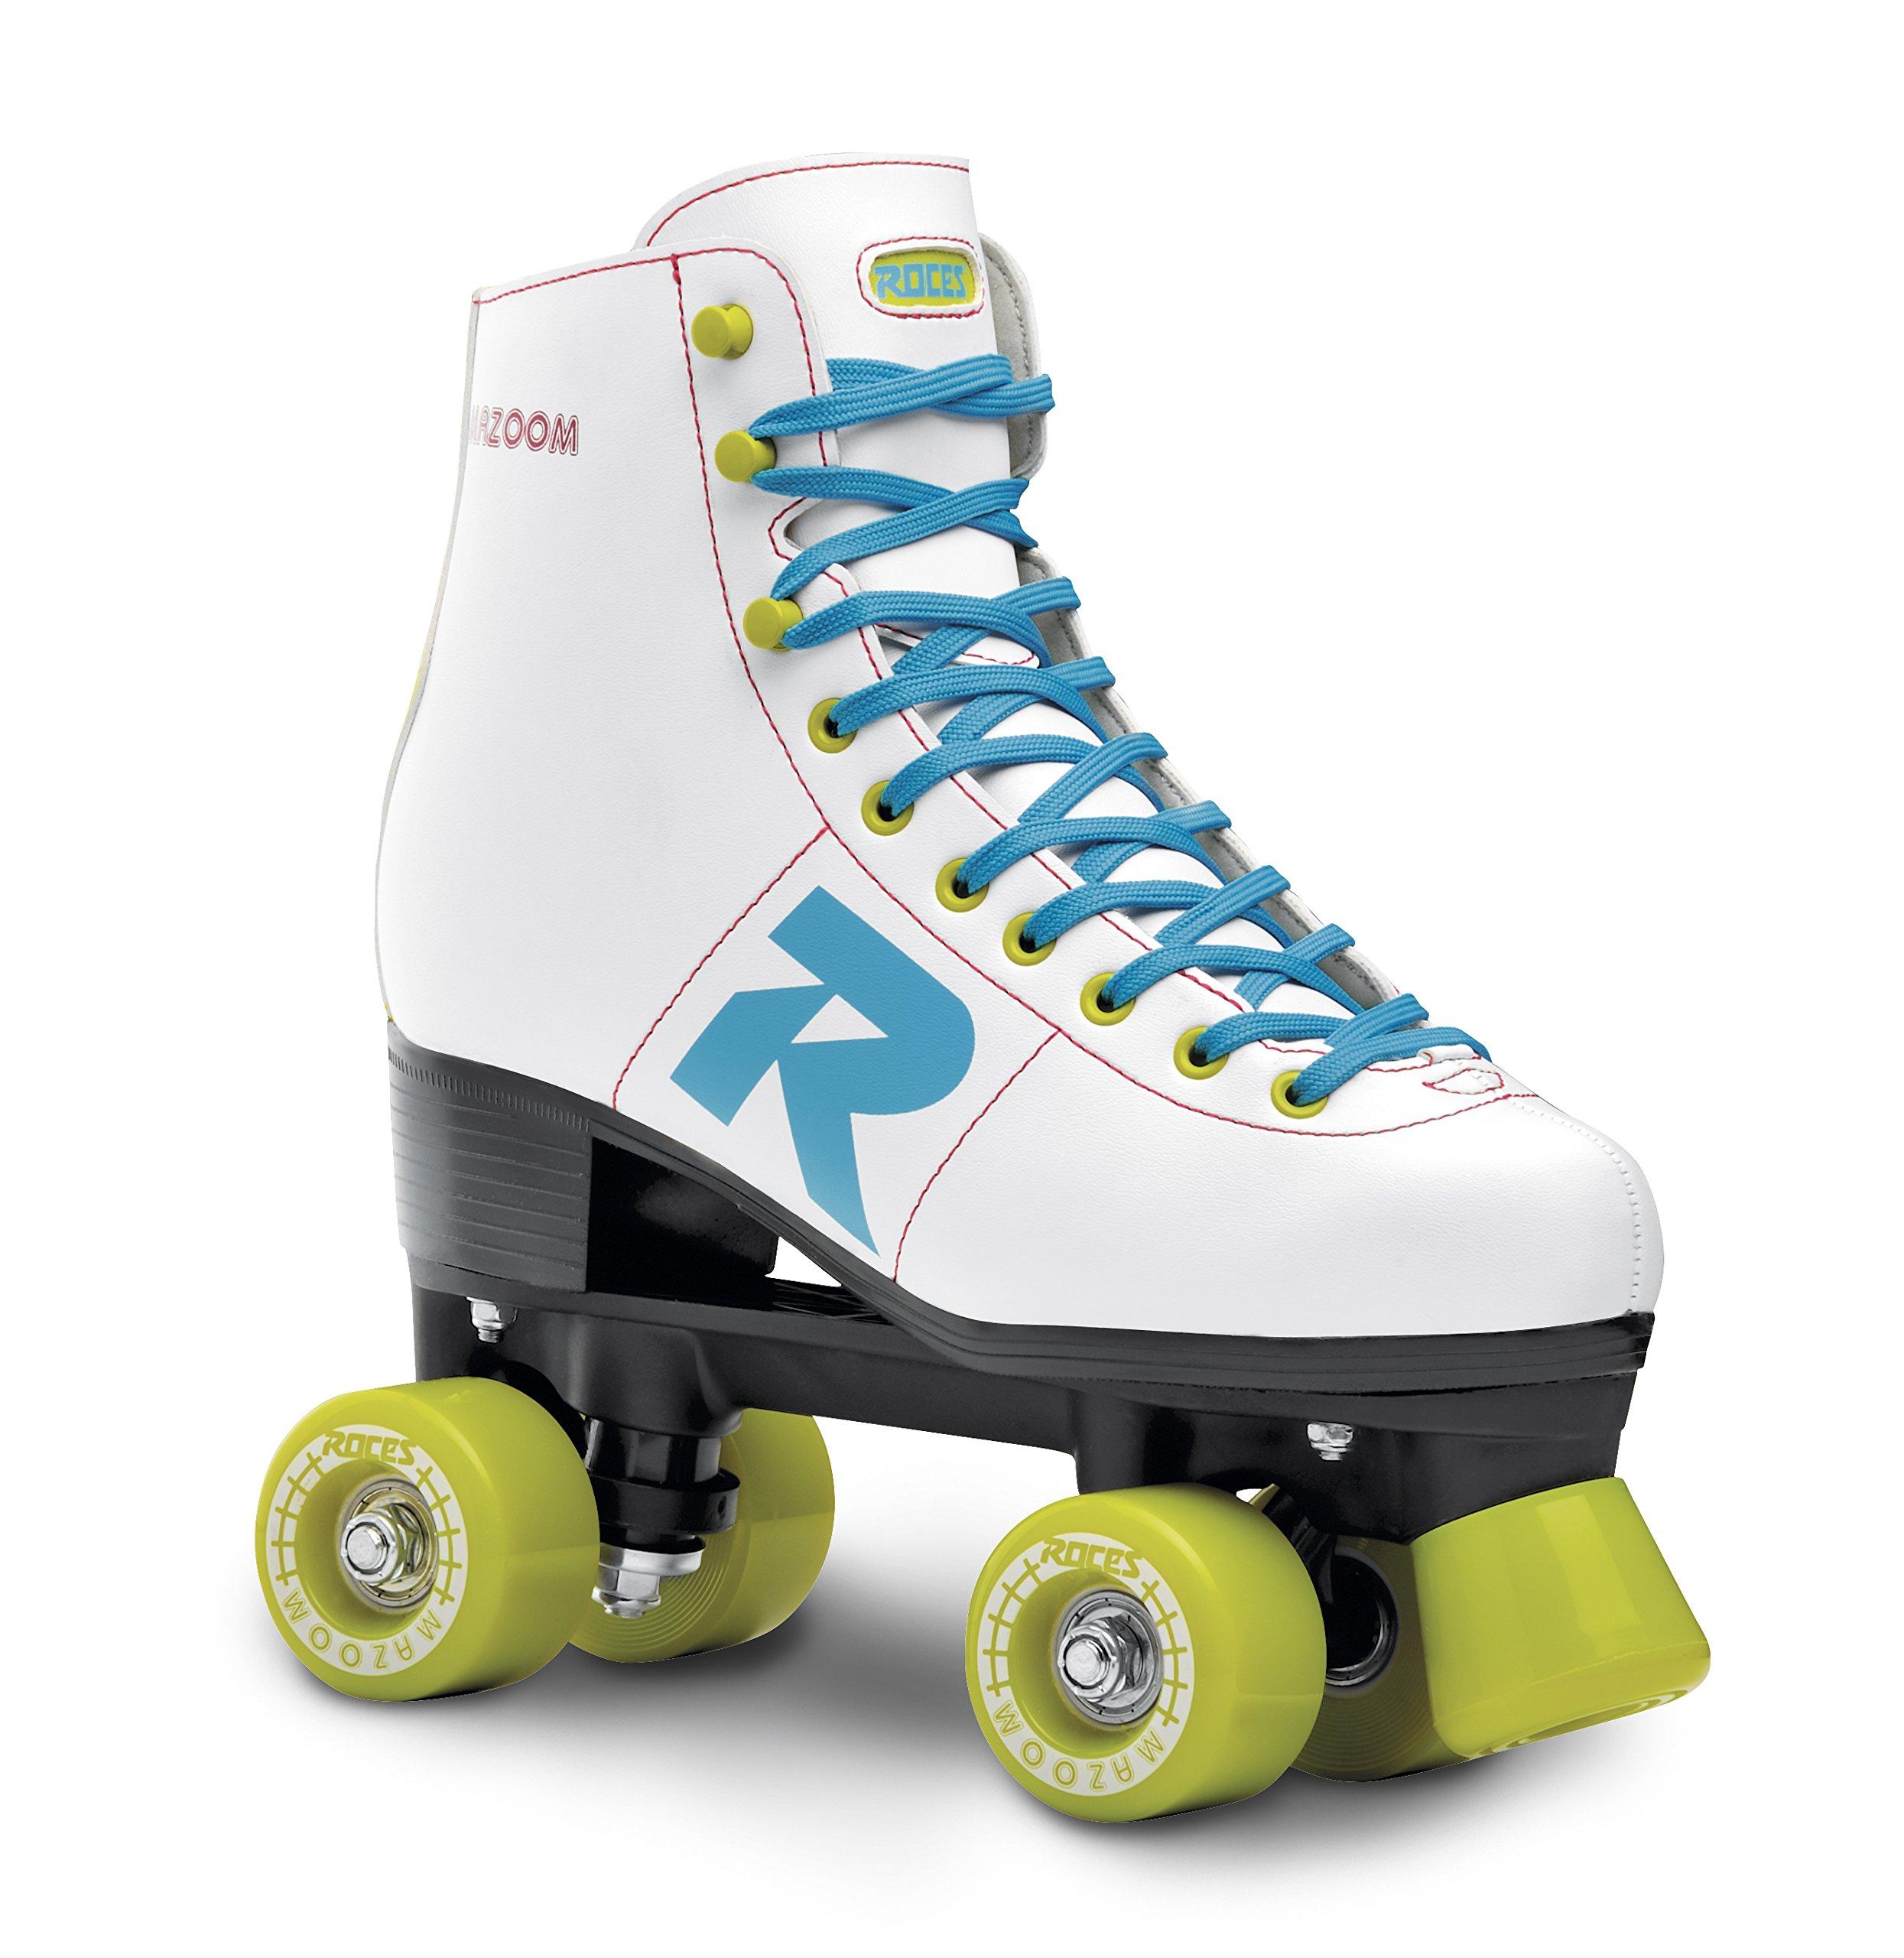 Roces 550064 Model Mazoom Roller Skate, US 3M/5W, White